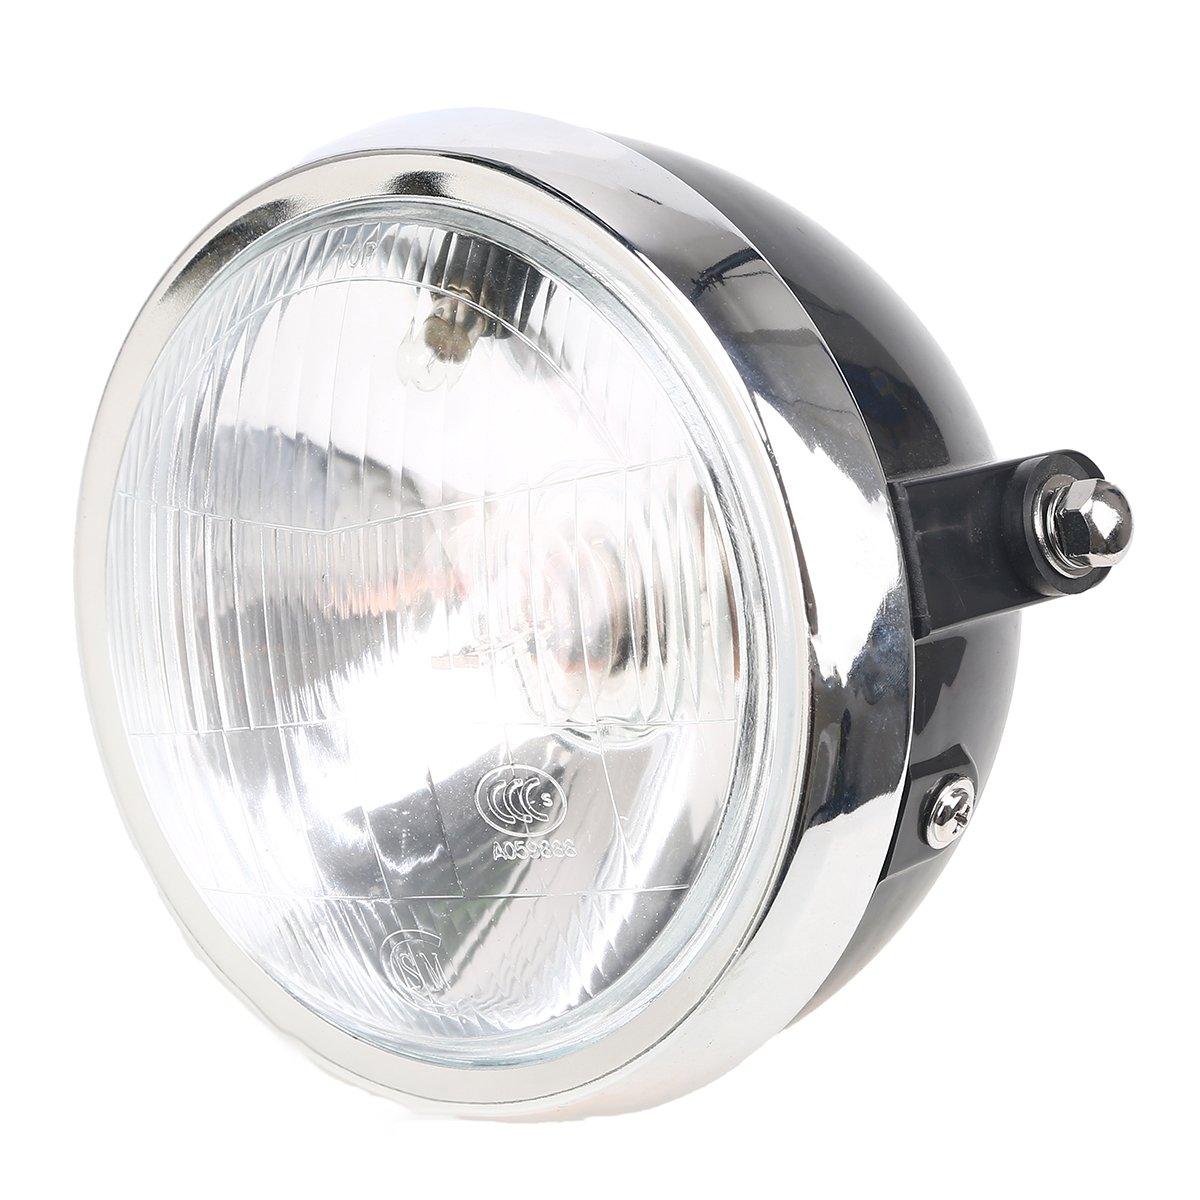 POSSBAY 5.9'' Motorbike Front Headlight High Low Beam Lamps 12V Amber for Honda CG125